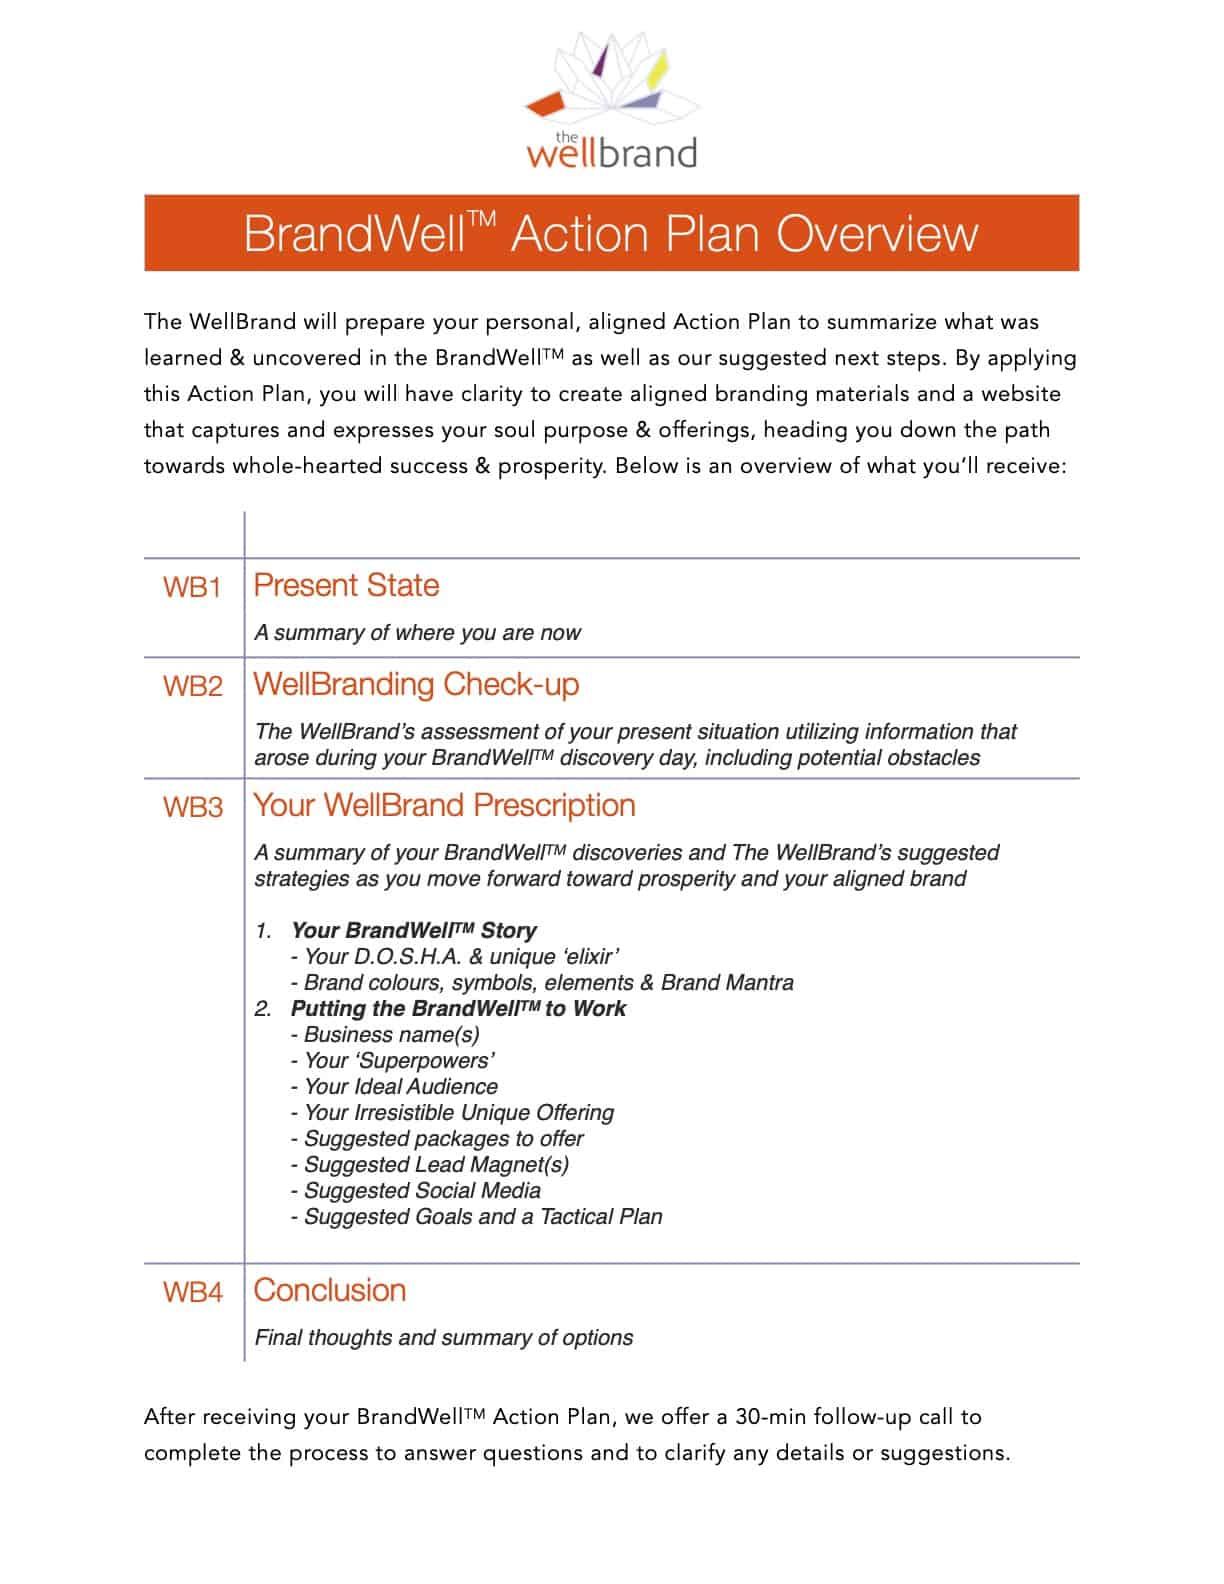 WelBrandl Action Plan Client Overview